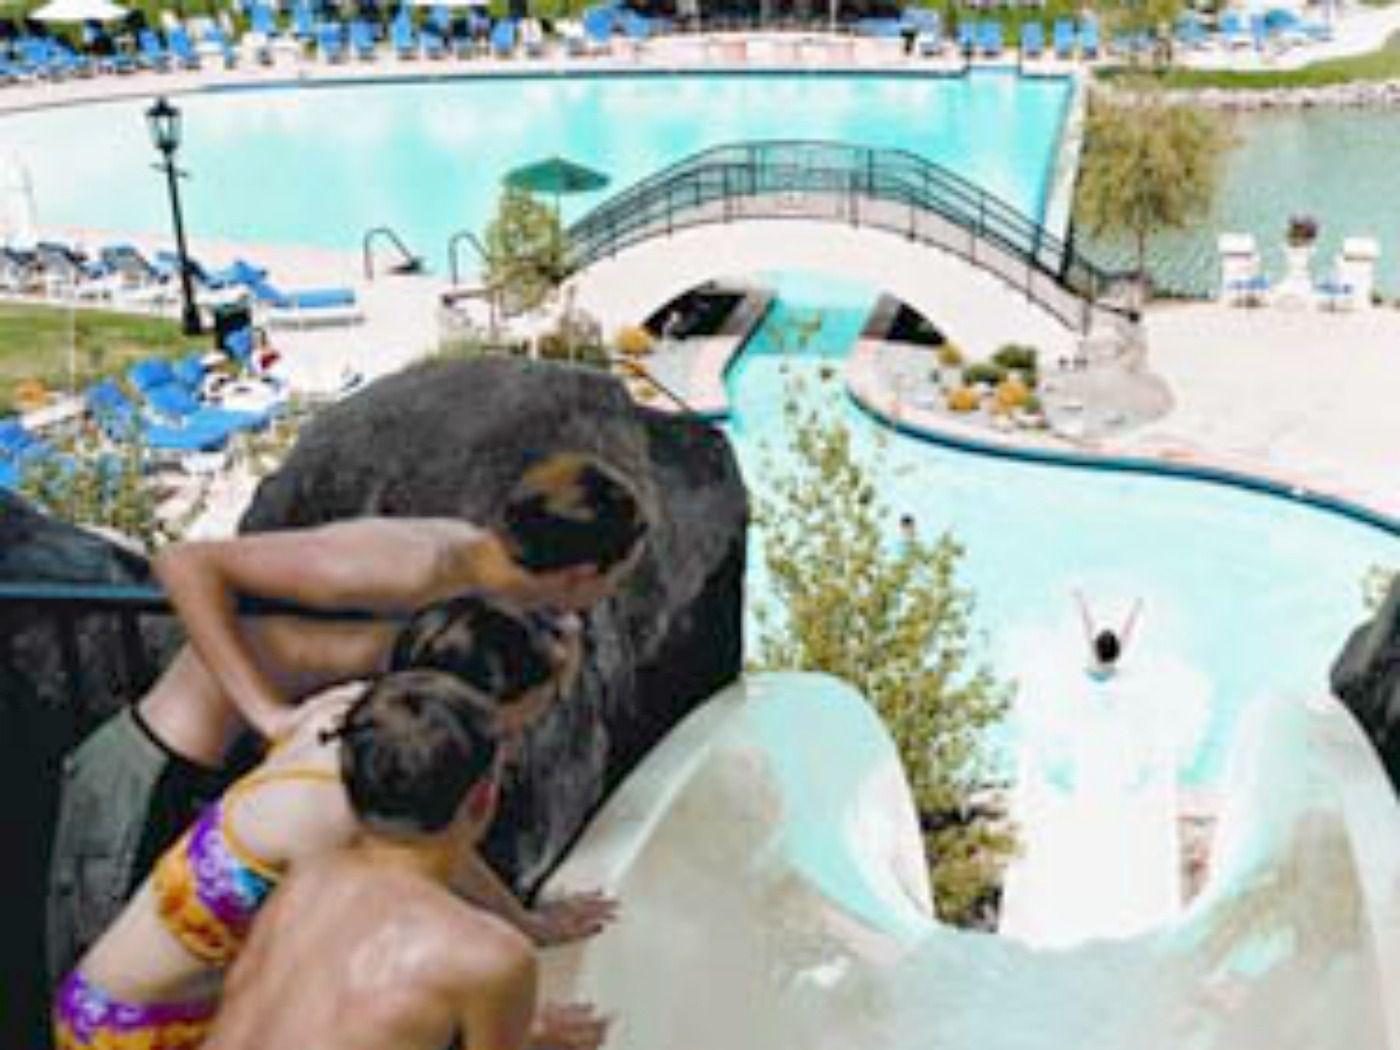 The Broadmoor Colorado Springs pool